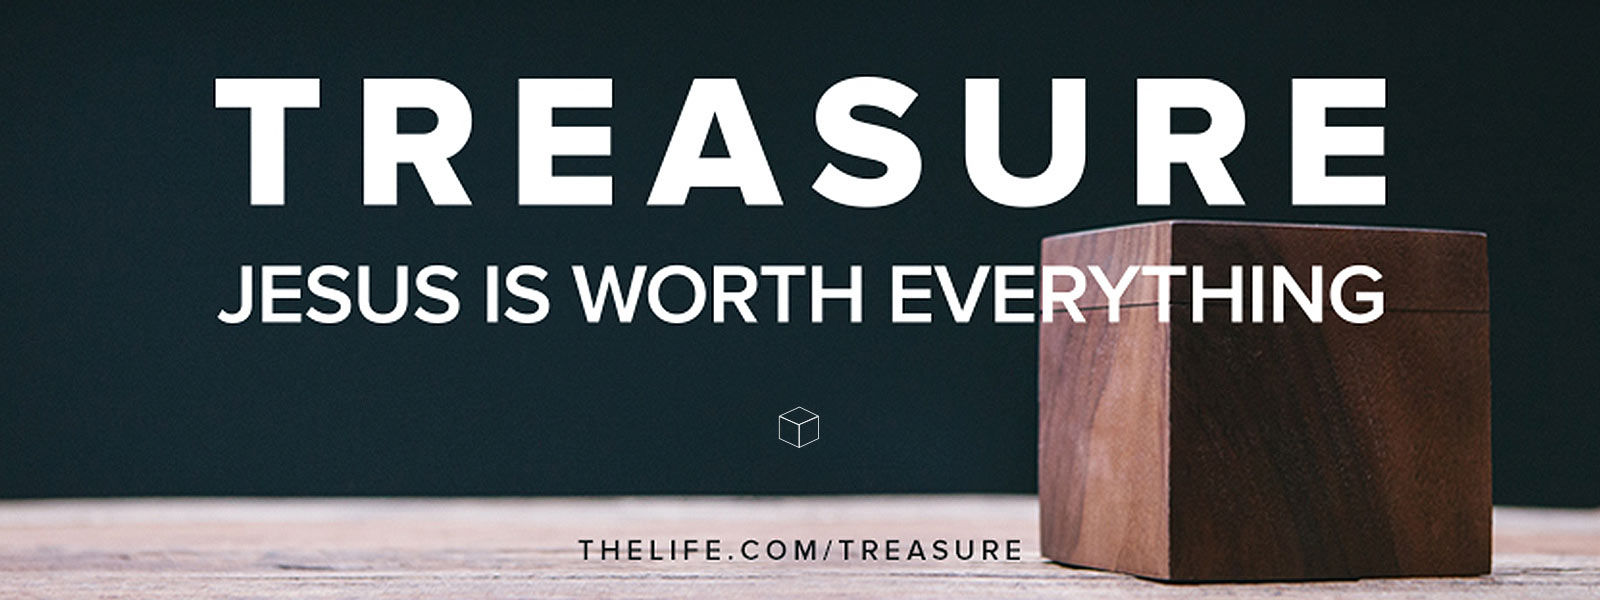 Treasure: Jesus is Worth Everything